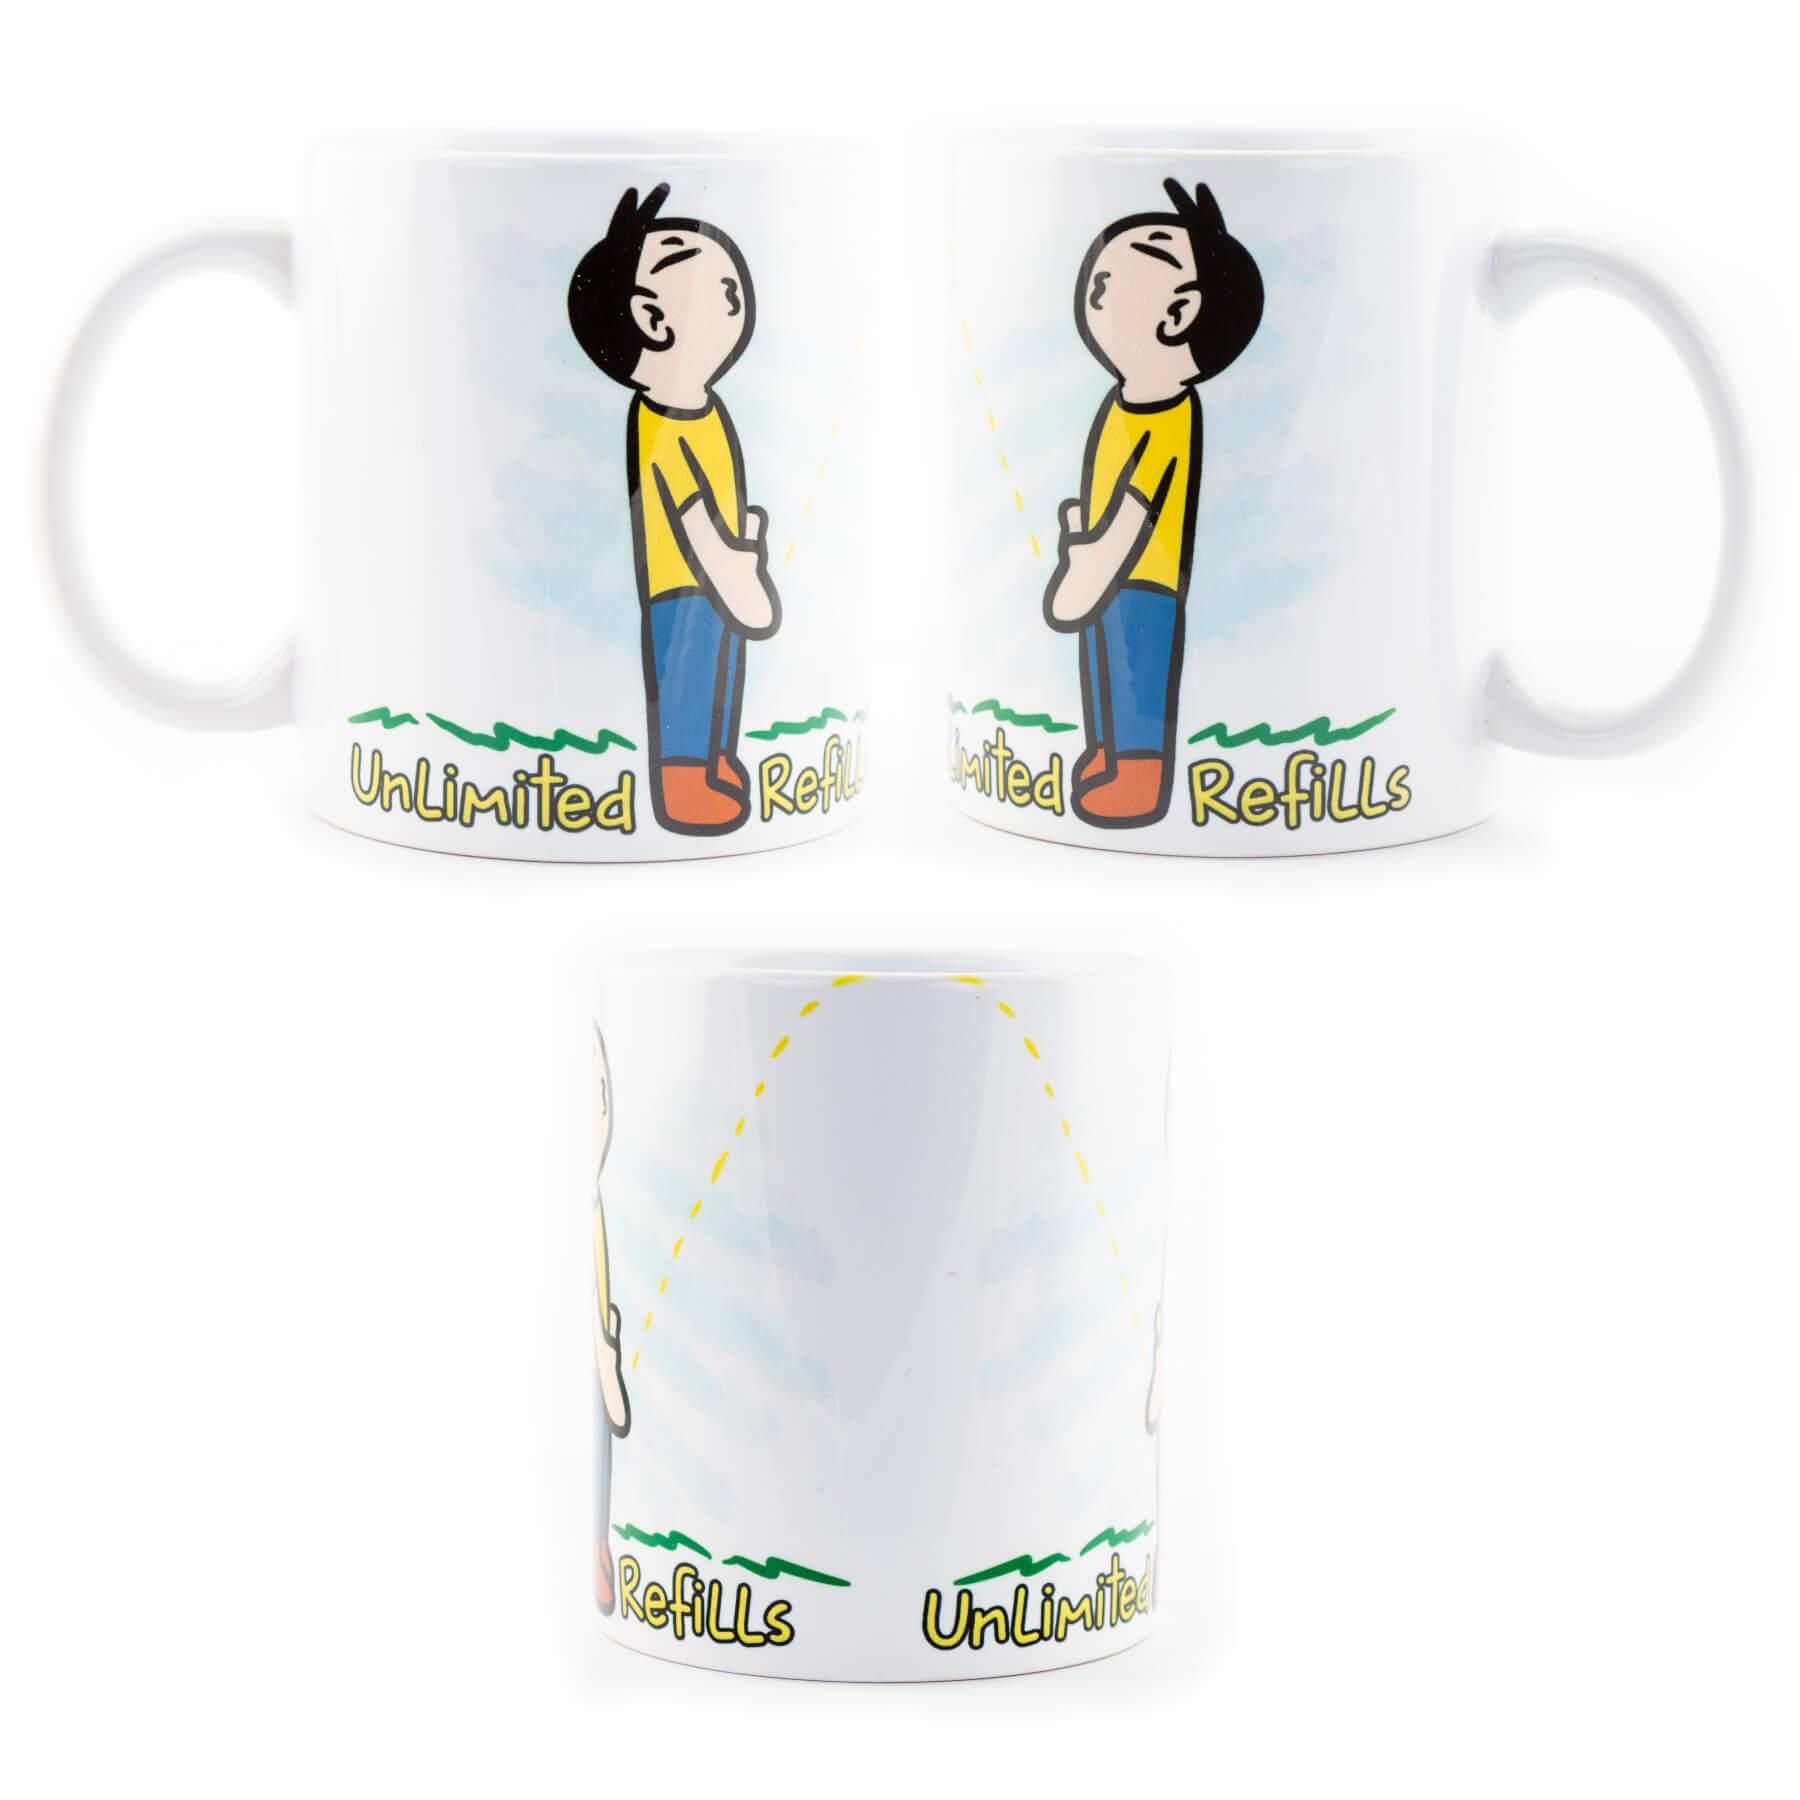 Unlimited Refills Mug